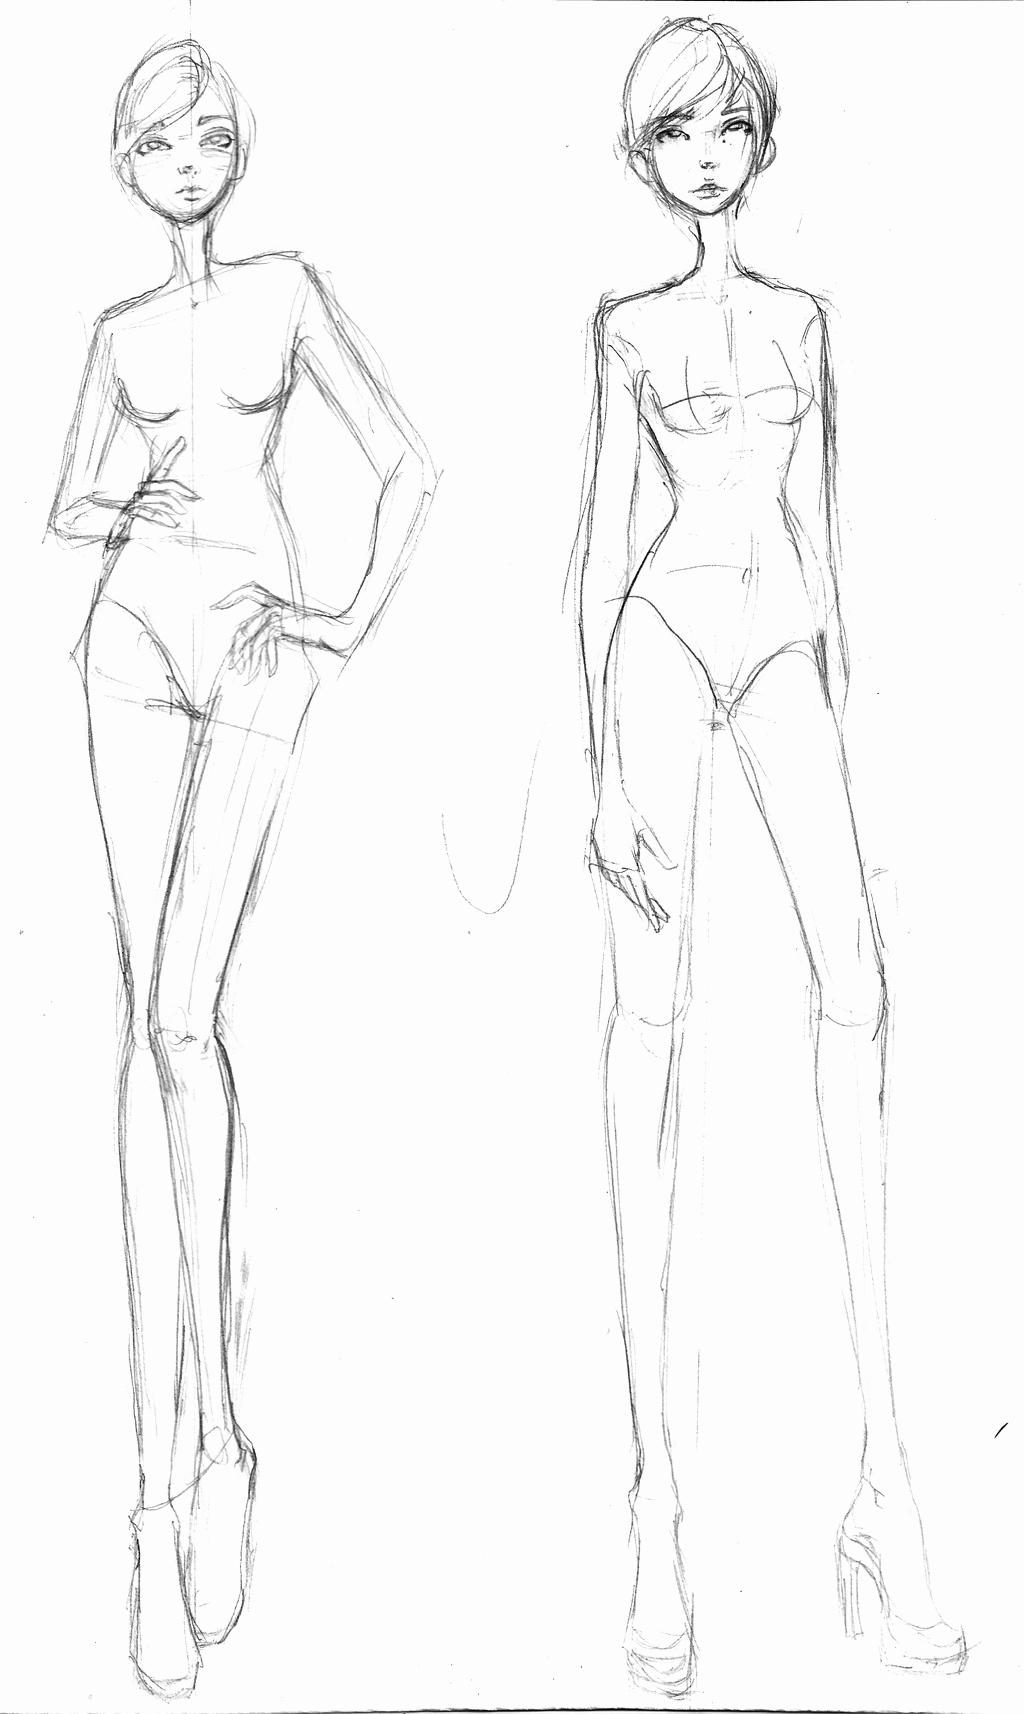 Body Drawing Template Beautiful Free Fashion Croquis 05 by Azute On Deviantart